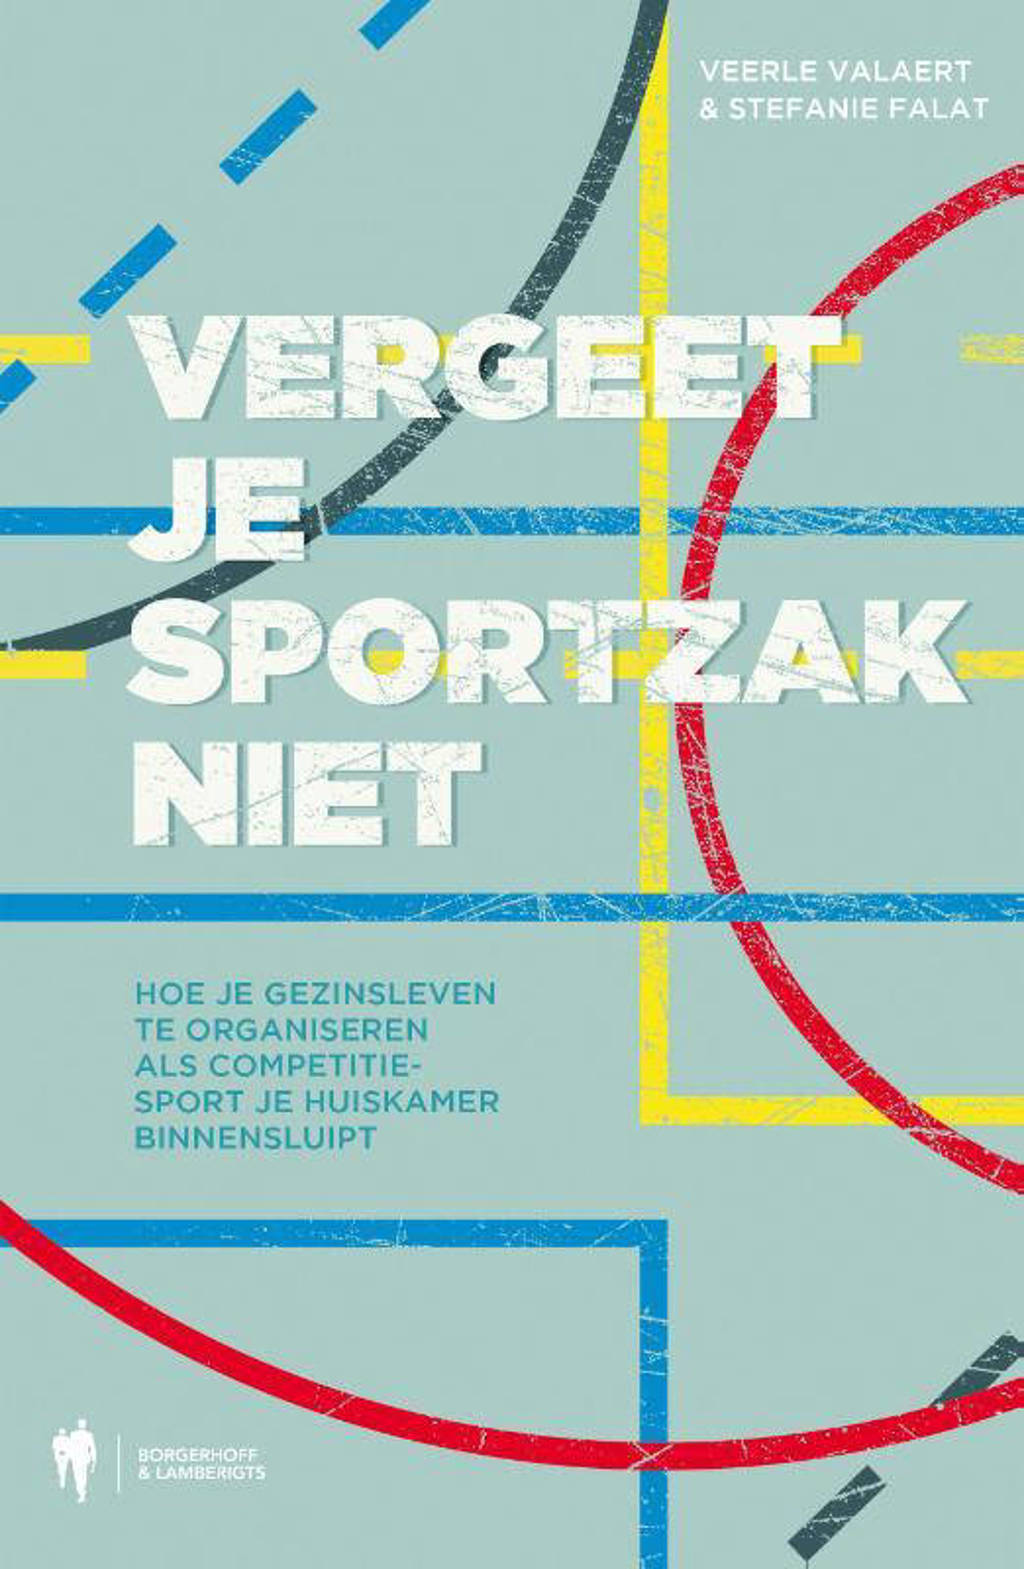 Vergeet je sportzak niet - Veerle Valaert en Stefanie Falat